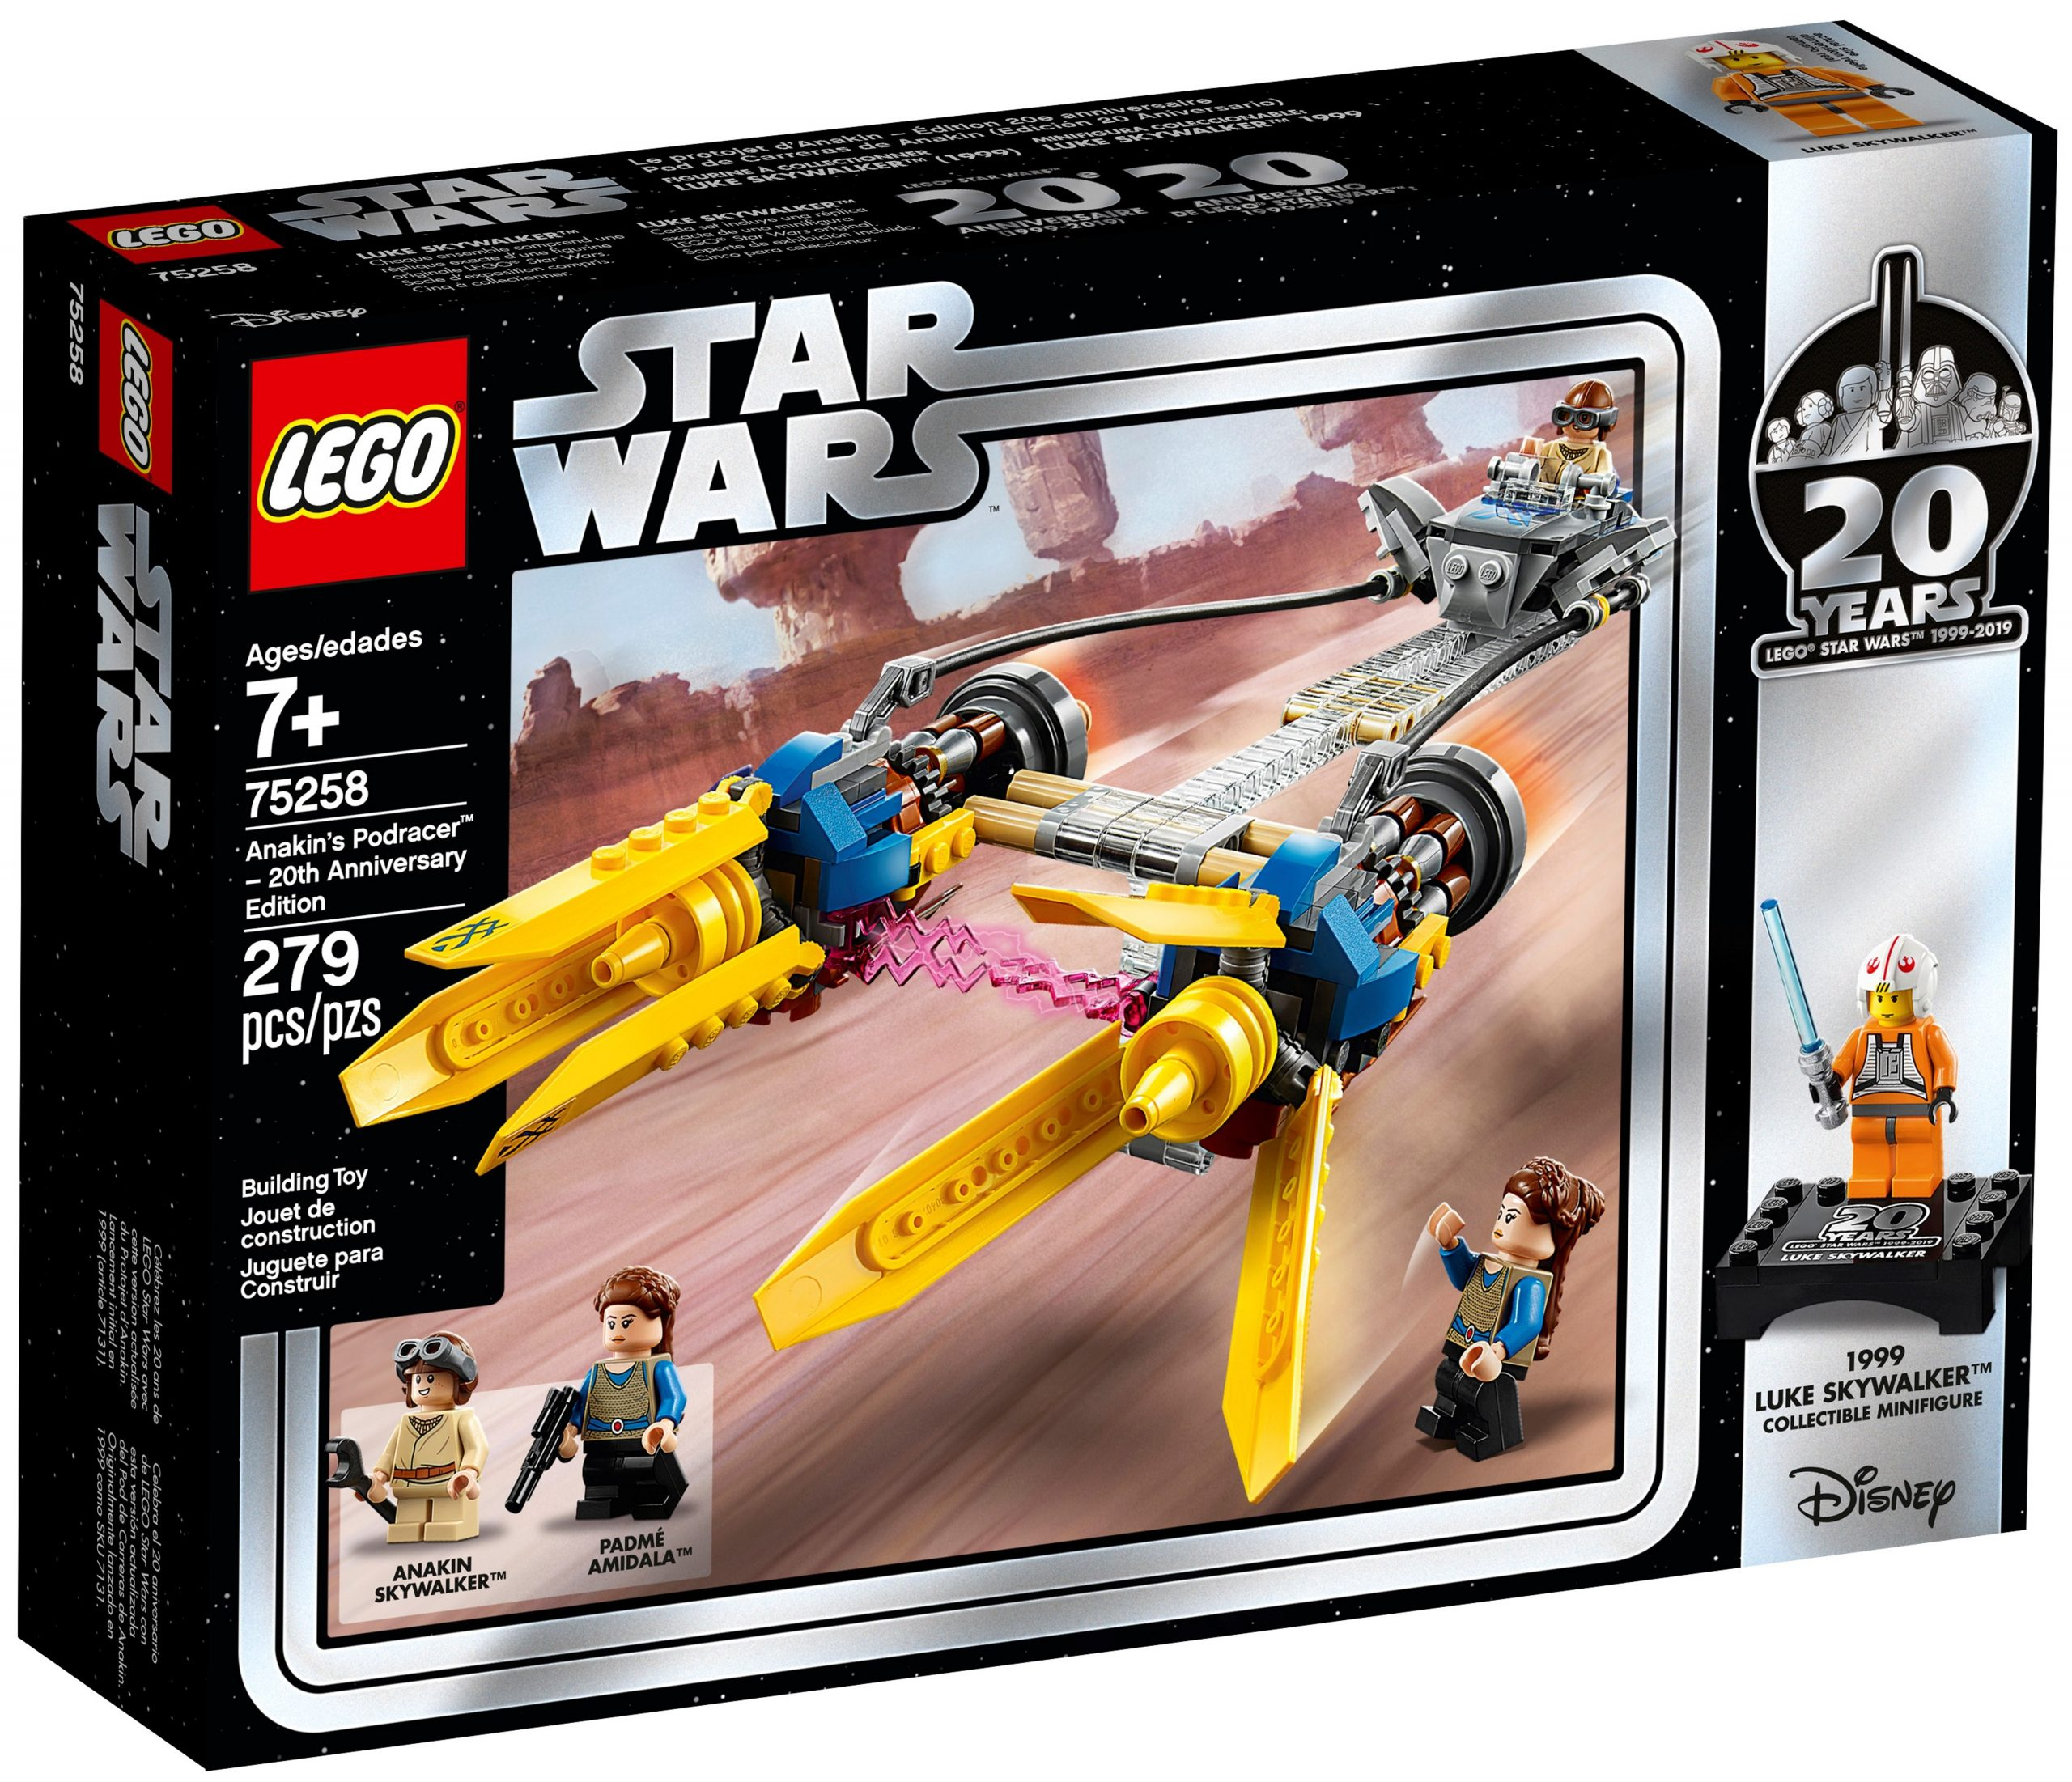 anakins podracer 20 jahre lego 75258 star wars scaled